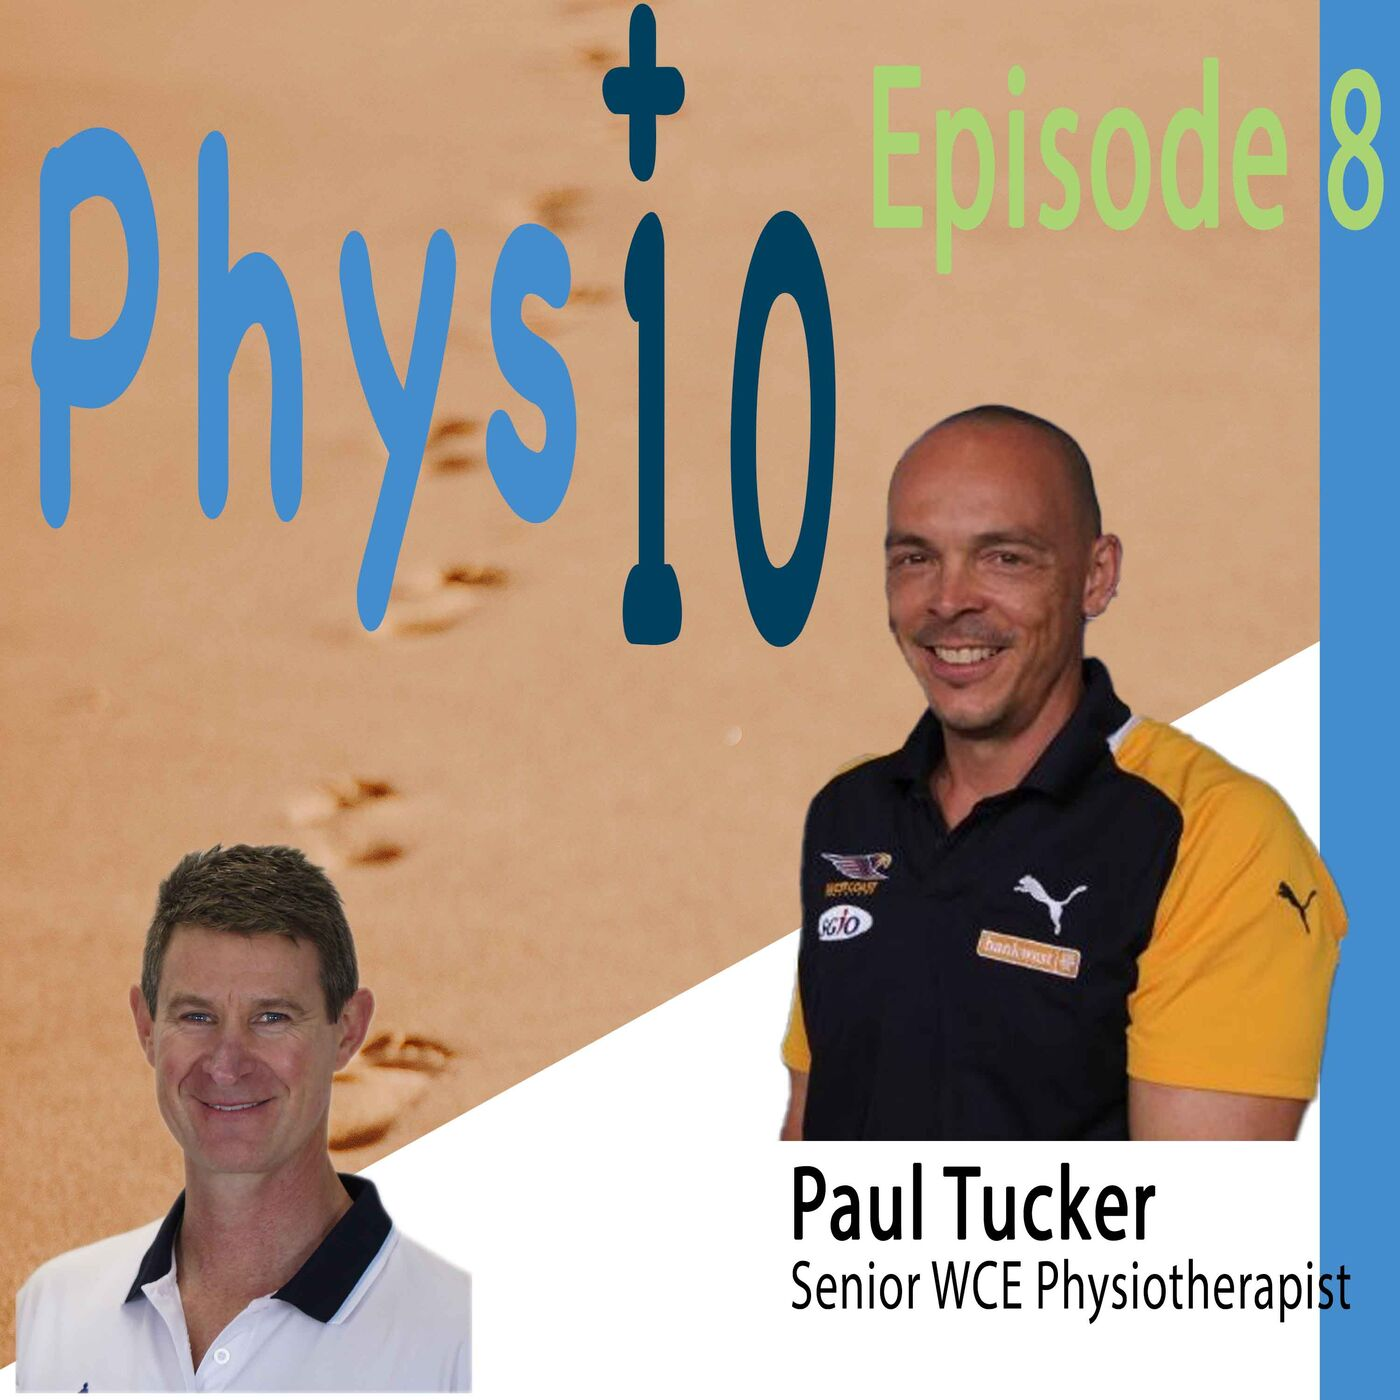 Paul Tucker: Clinician | Senior WCE Physiotherapist